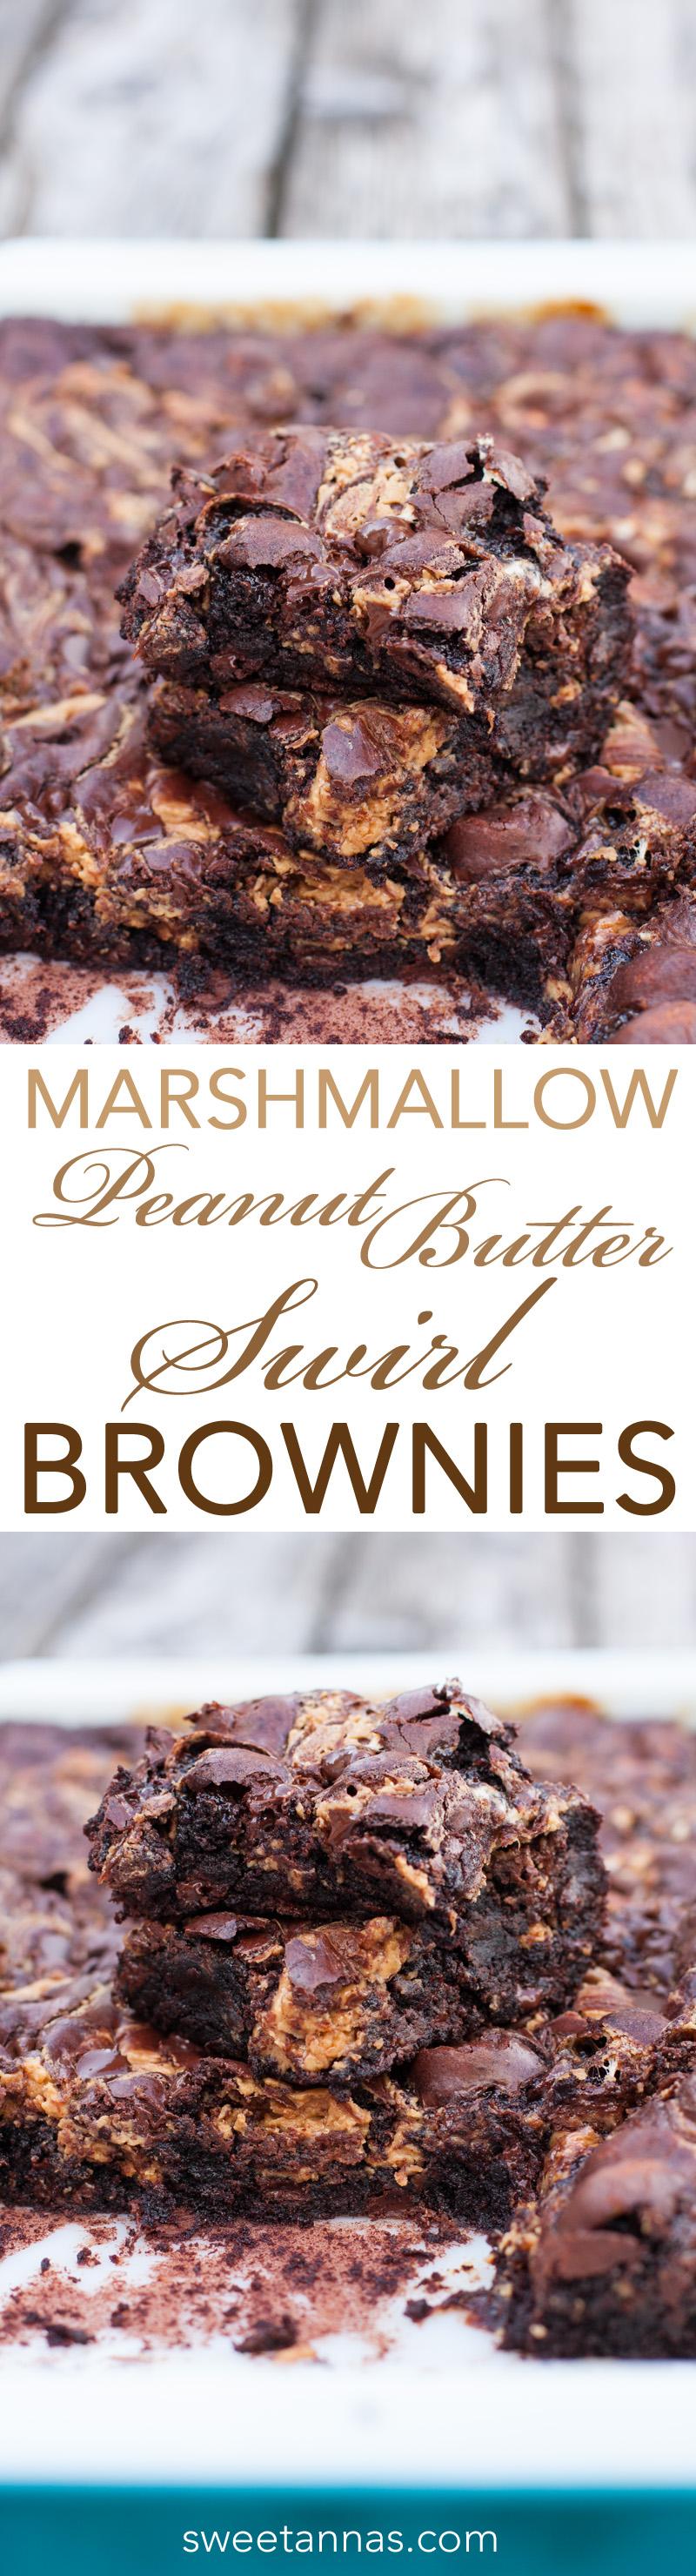 Marshmallow Peanut Butter Swirl MADE-FROM-SCRATCH Brownies! (Gluten Free OR Gluten Full!) | sweetannas.com